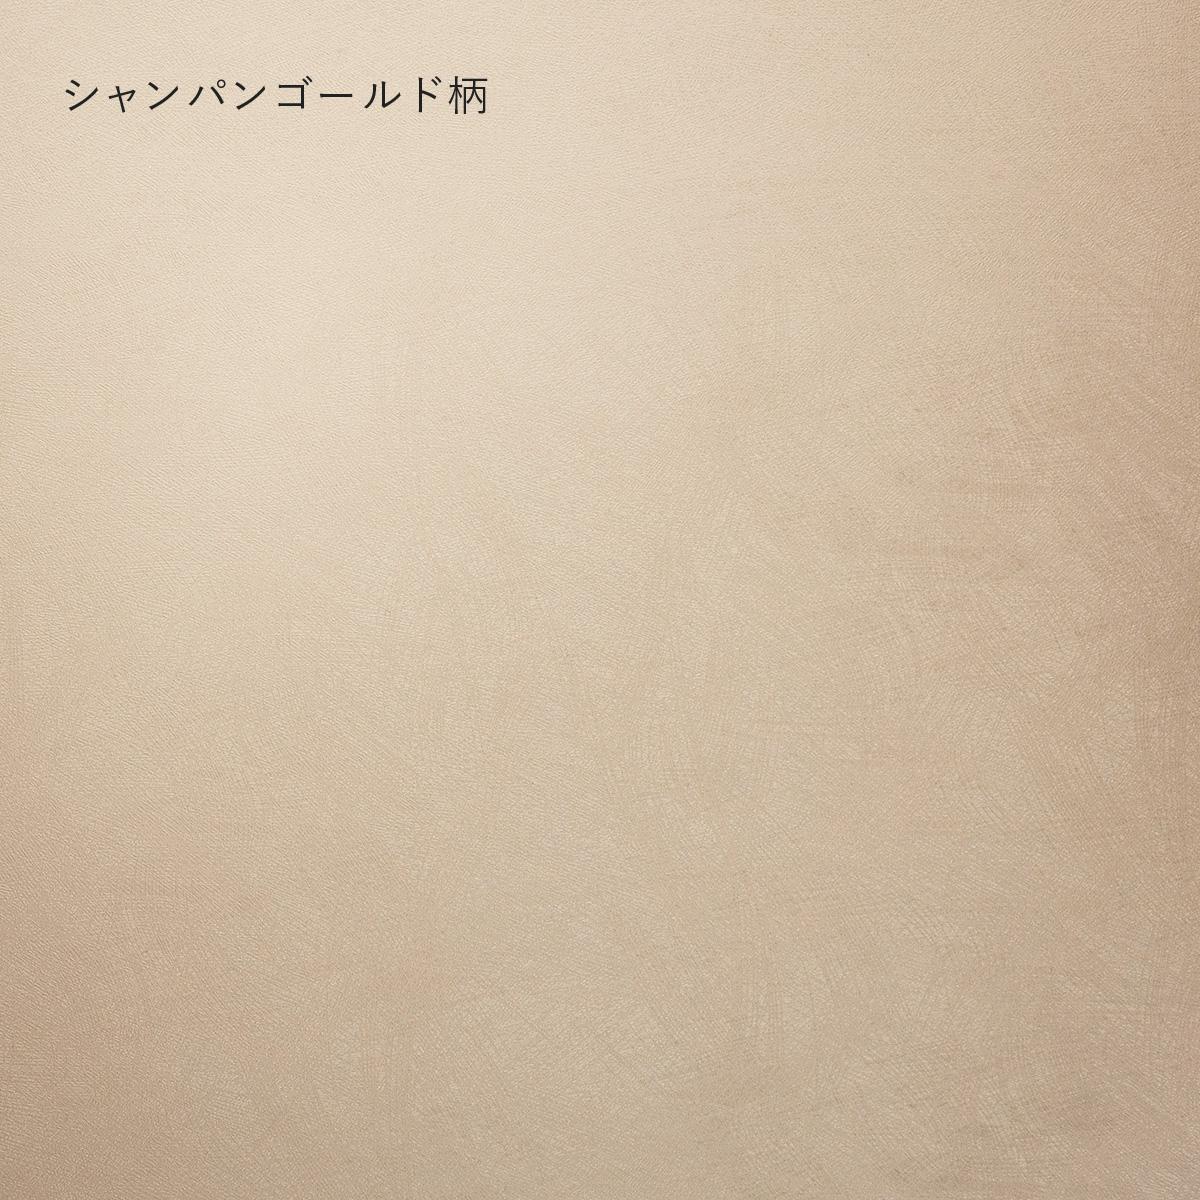 【V-TISS LIGHT】 コの字棚板